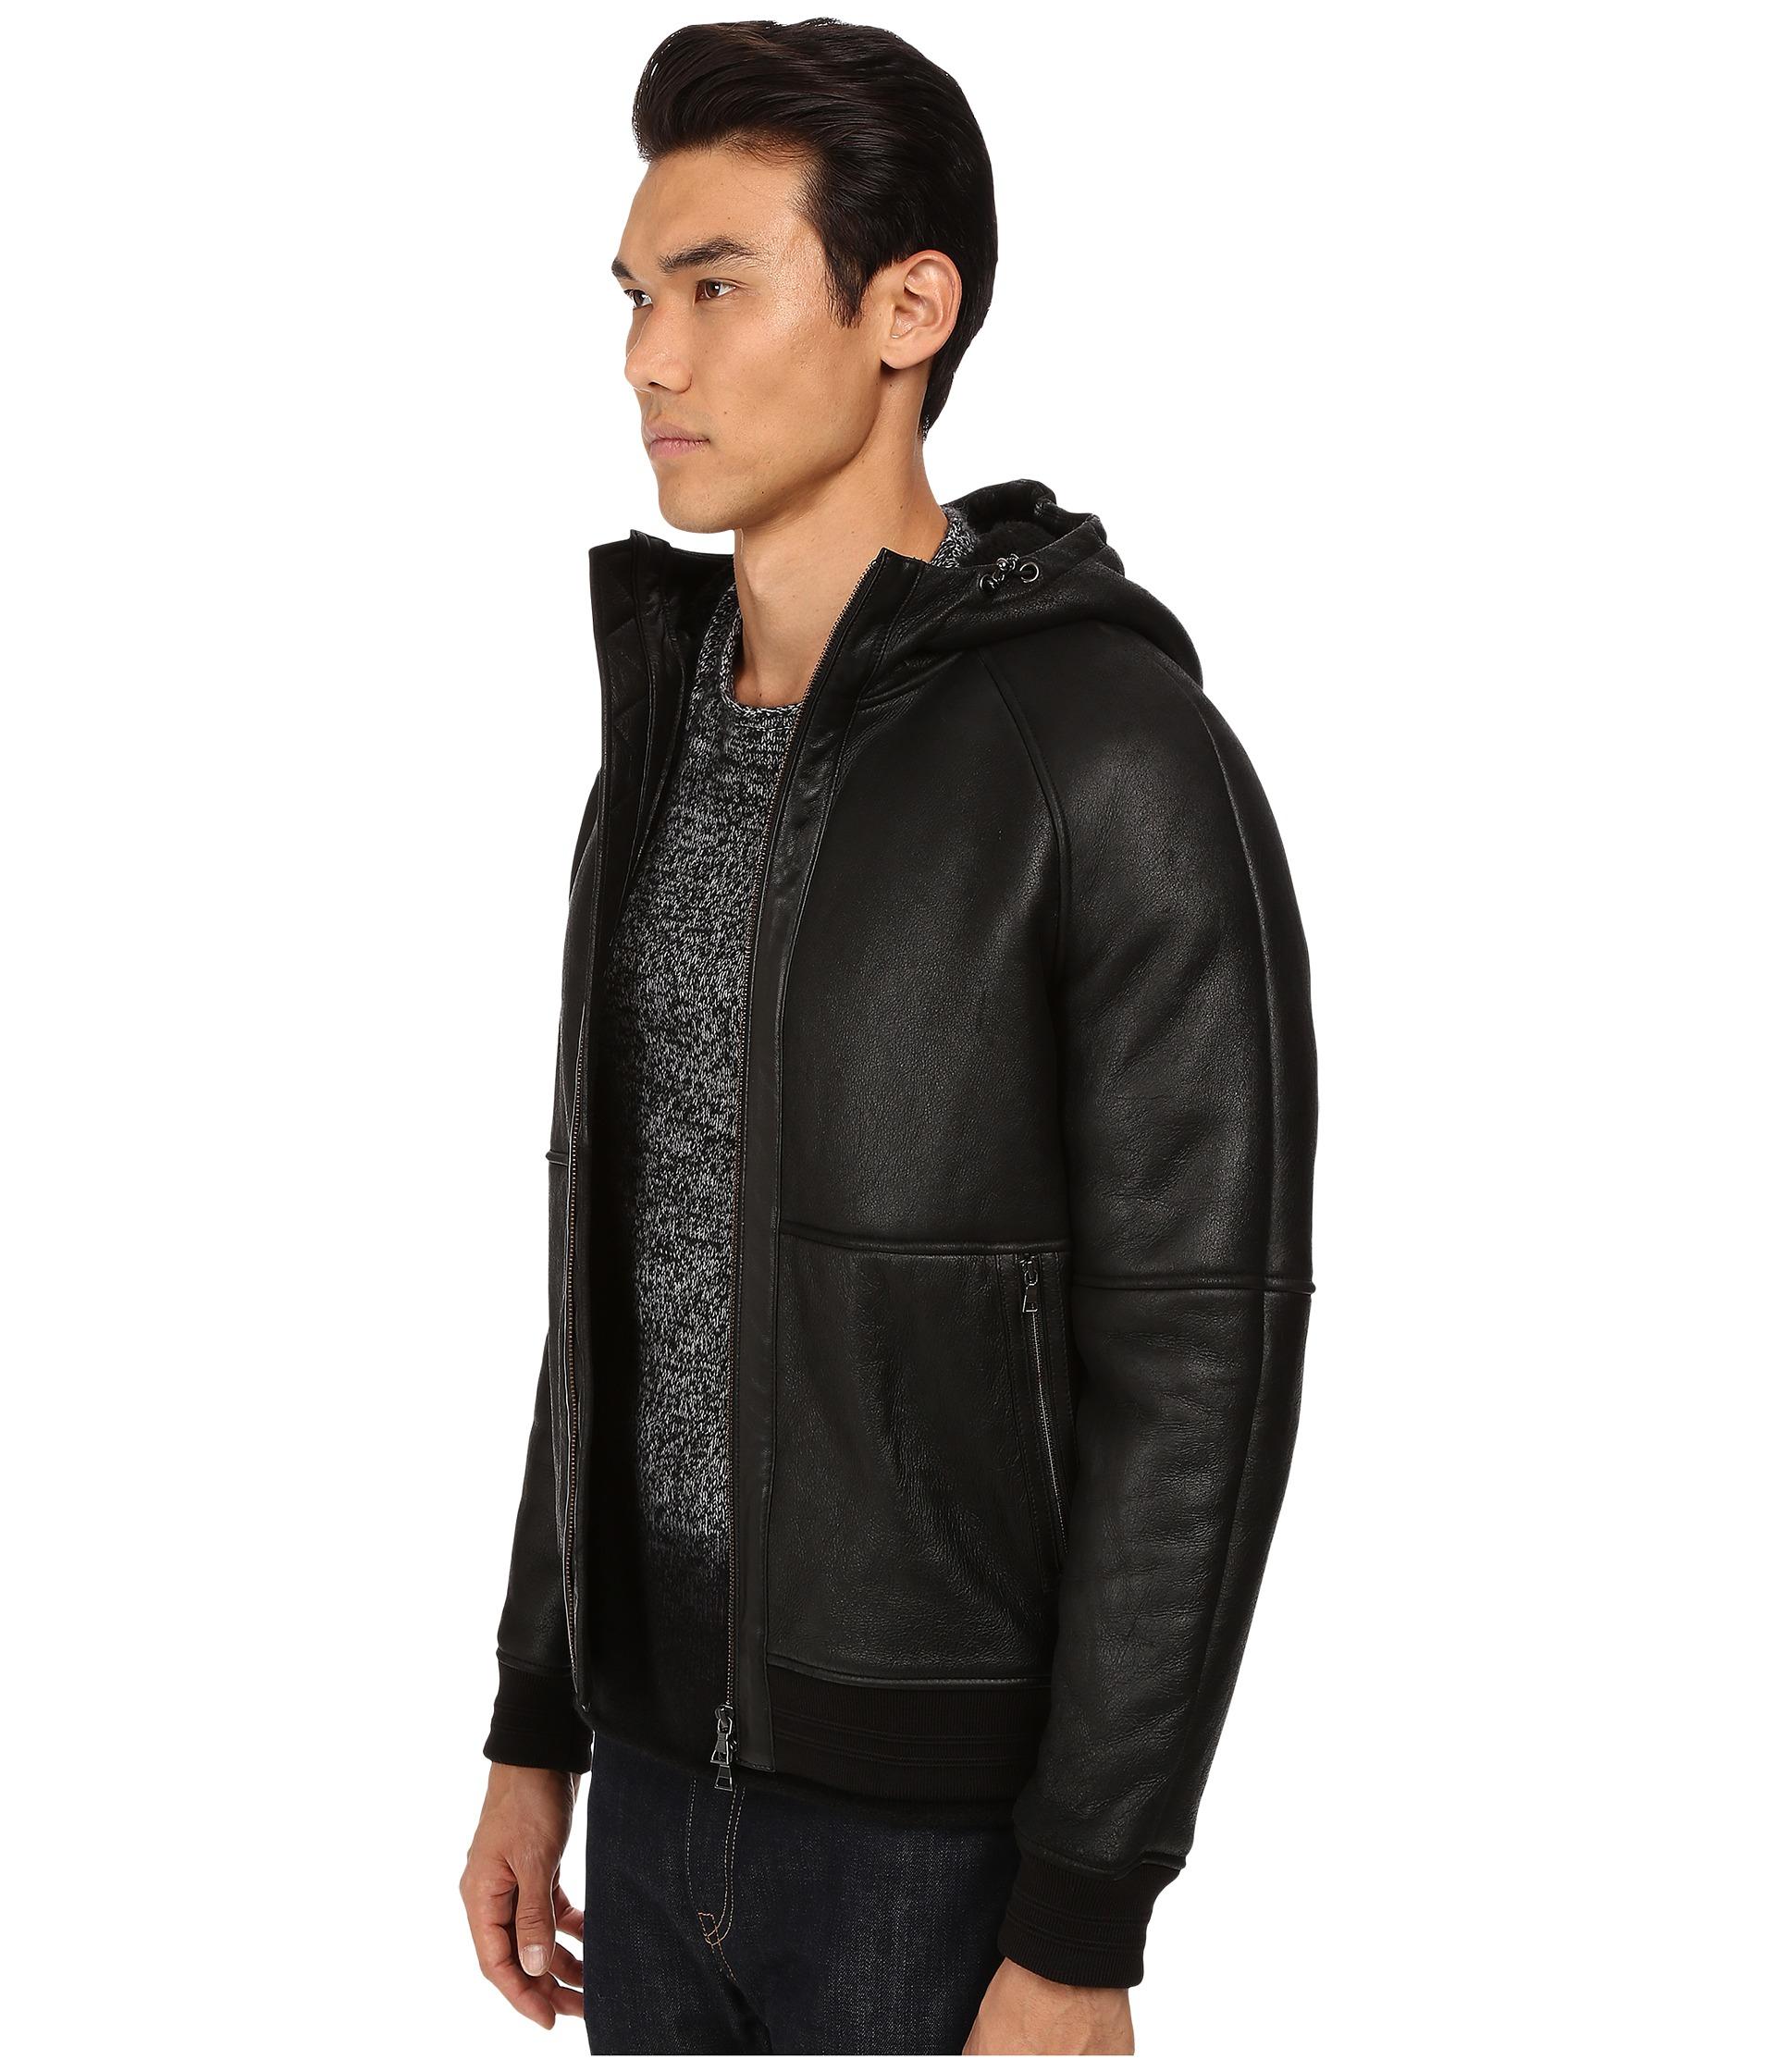 Lyst - Vince Hooded Shearling Jacket in Black for Men 002cf7192